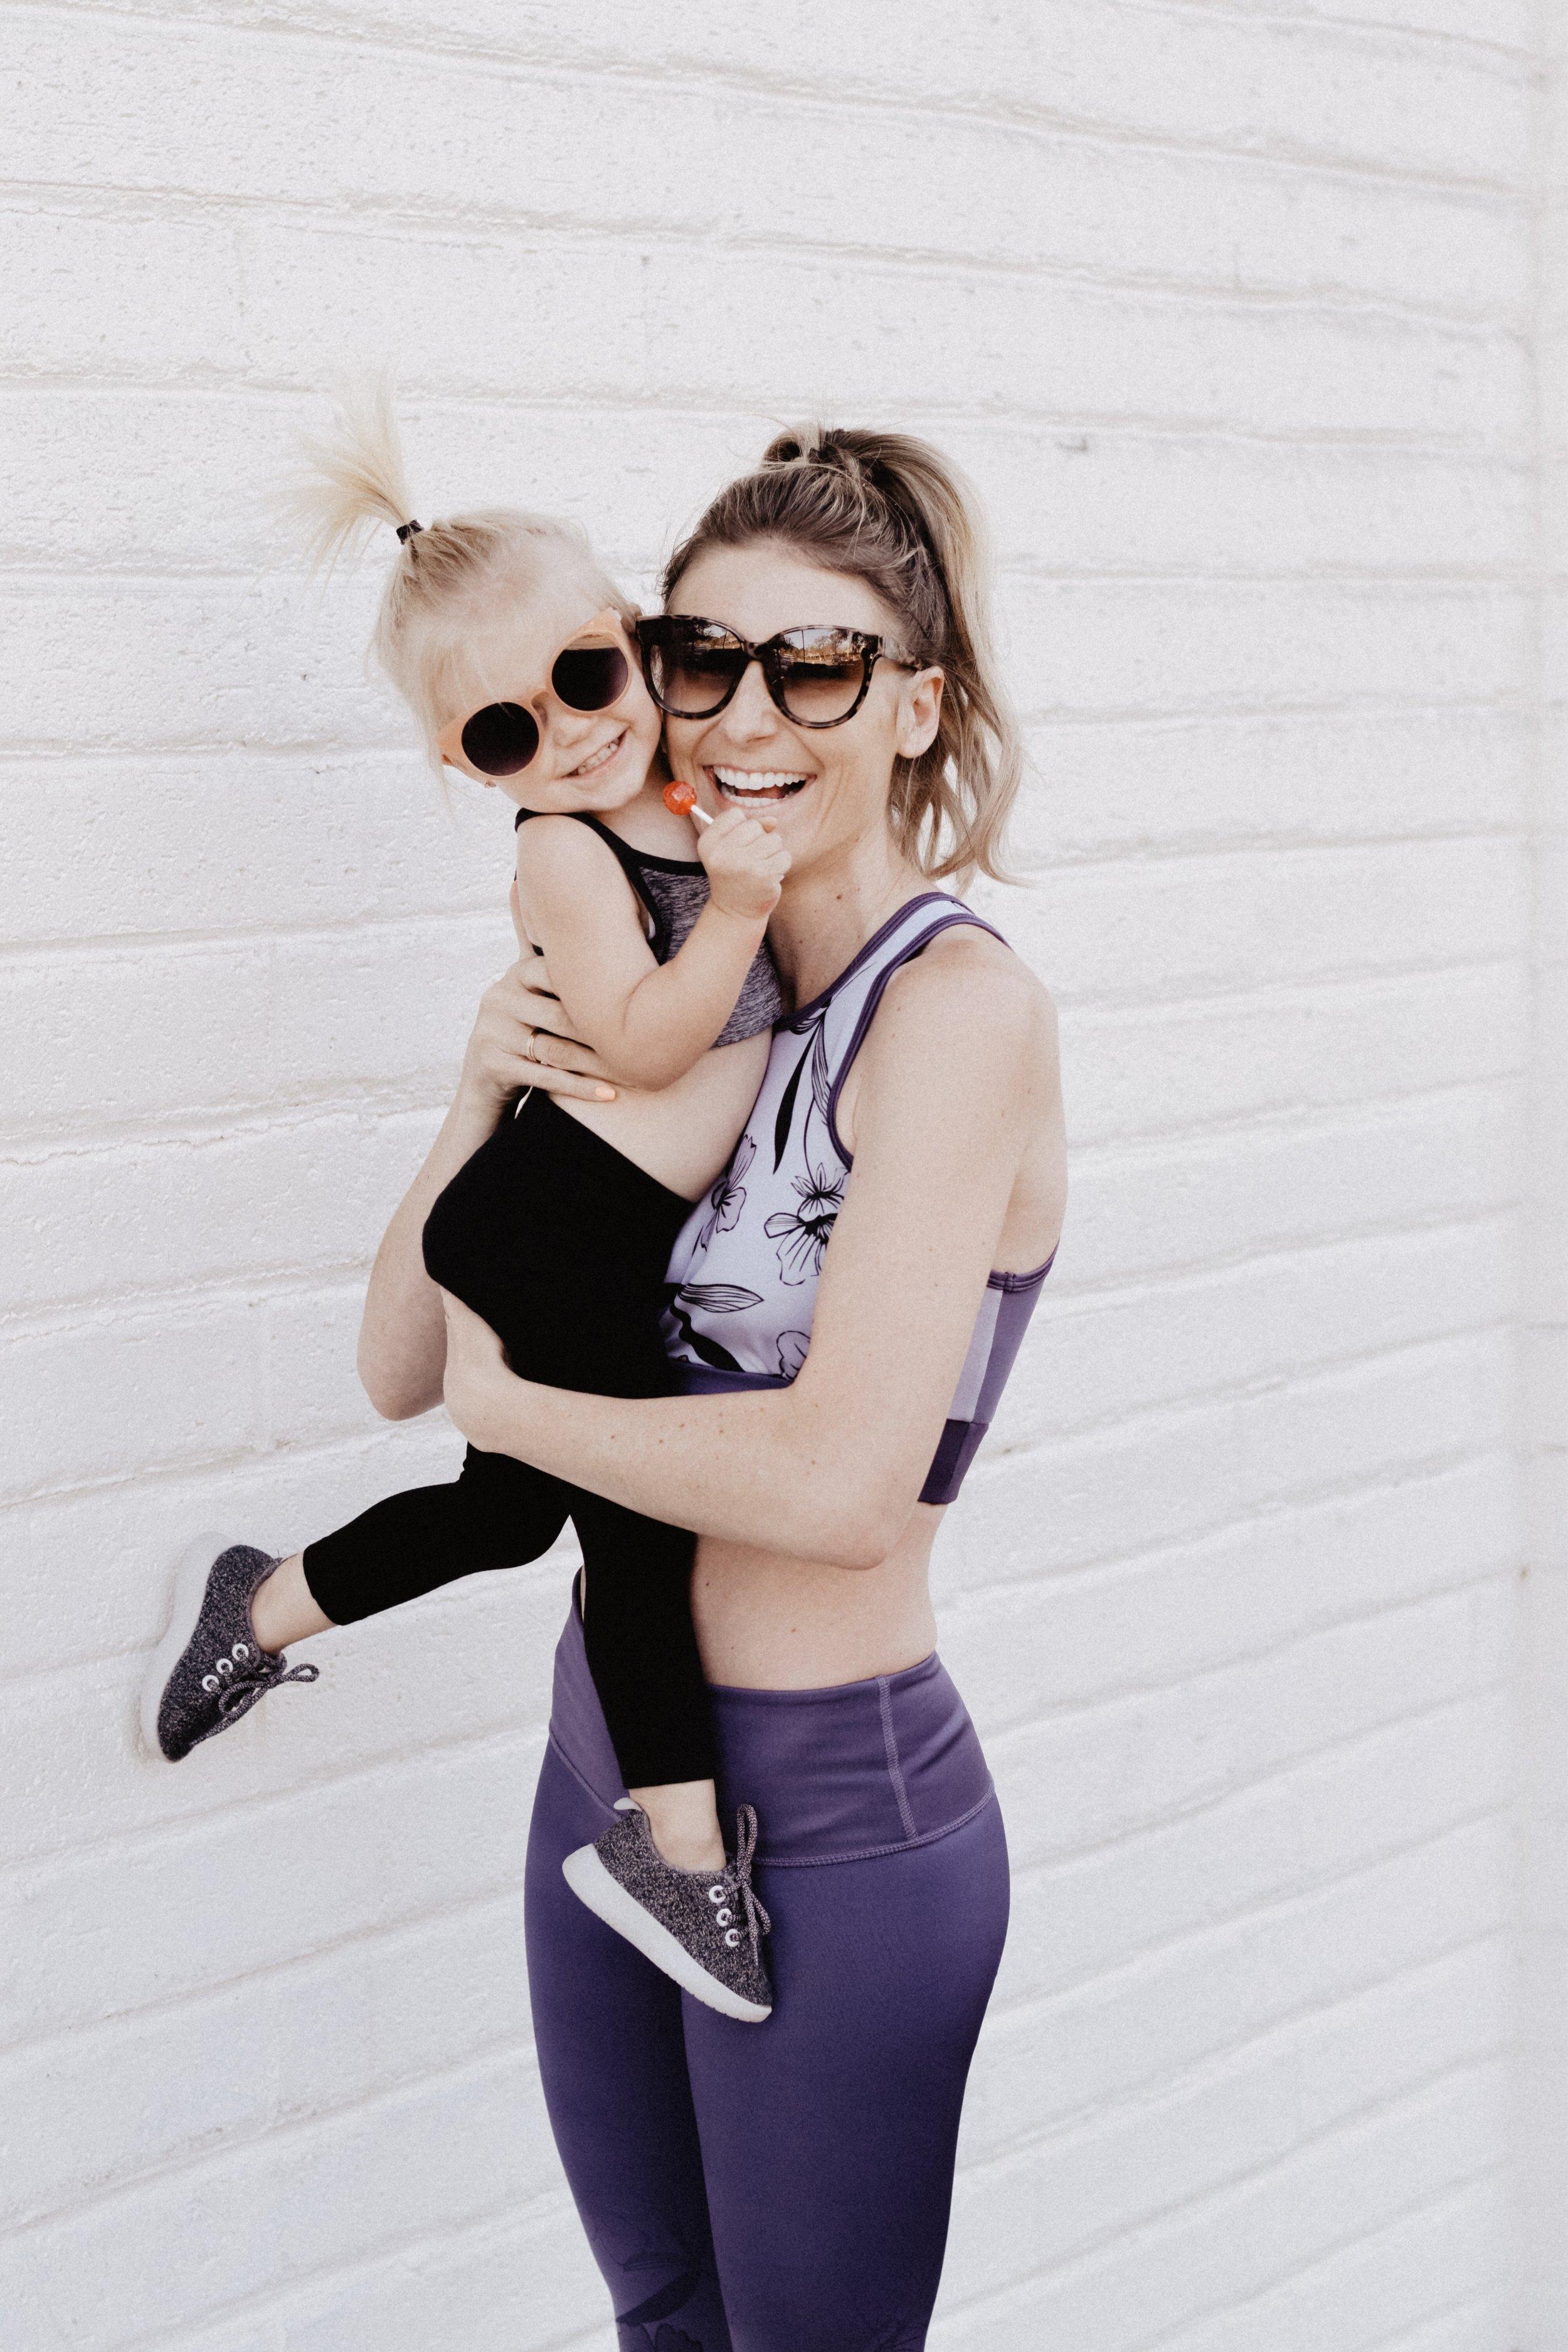 Cute Kids Sunglasses - Toddler Sunglasses - Baby Sunglasses